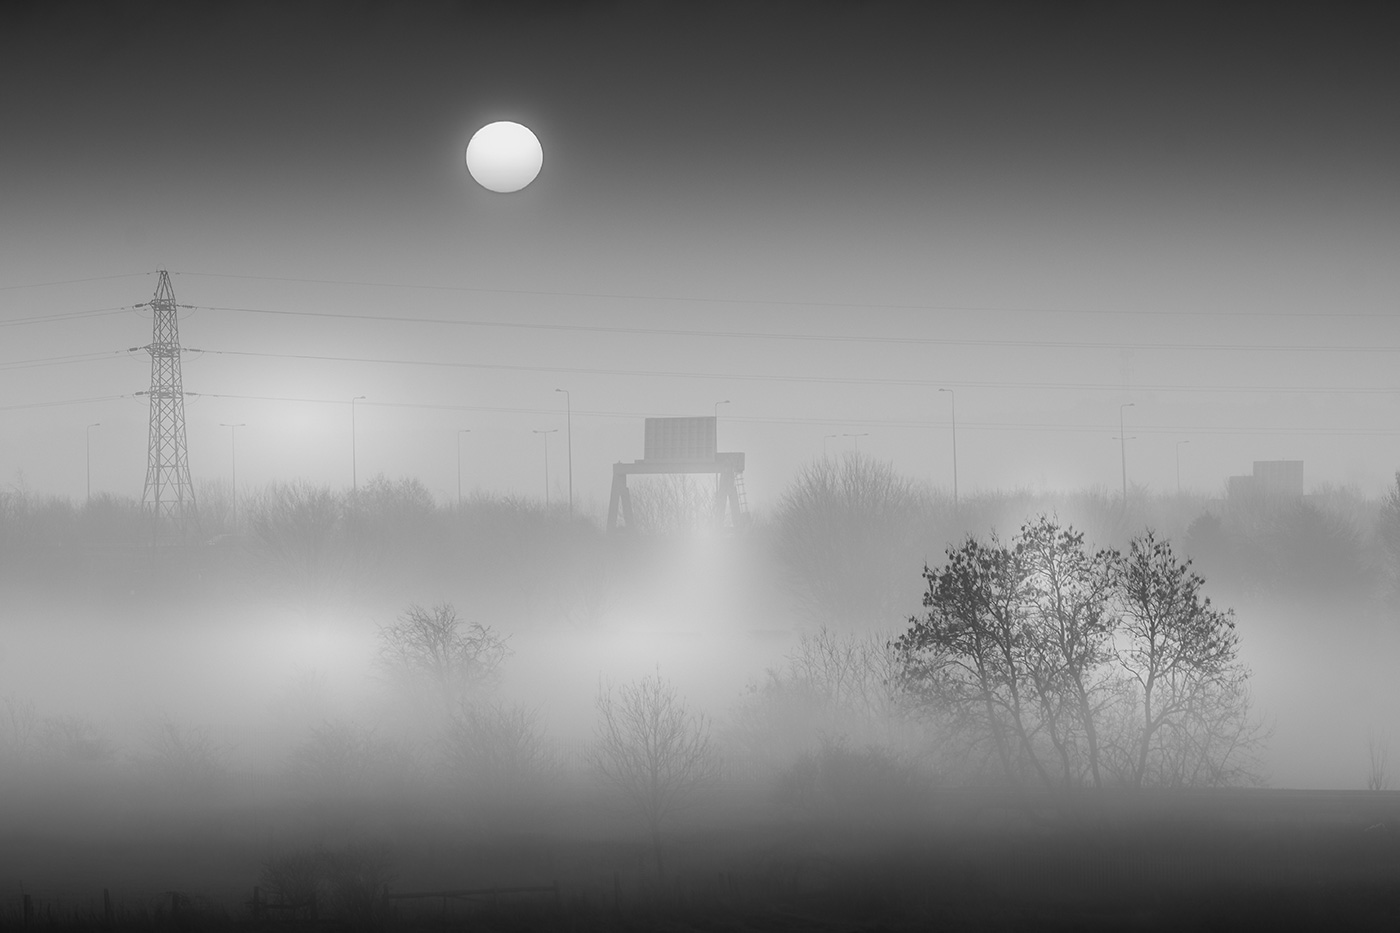 Misty Morning Through The Window